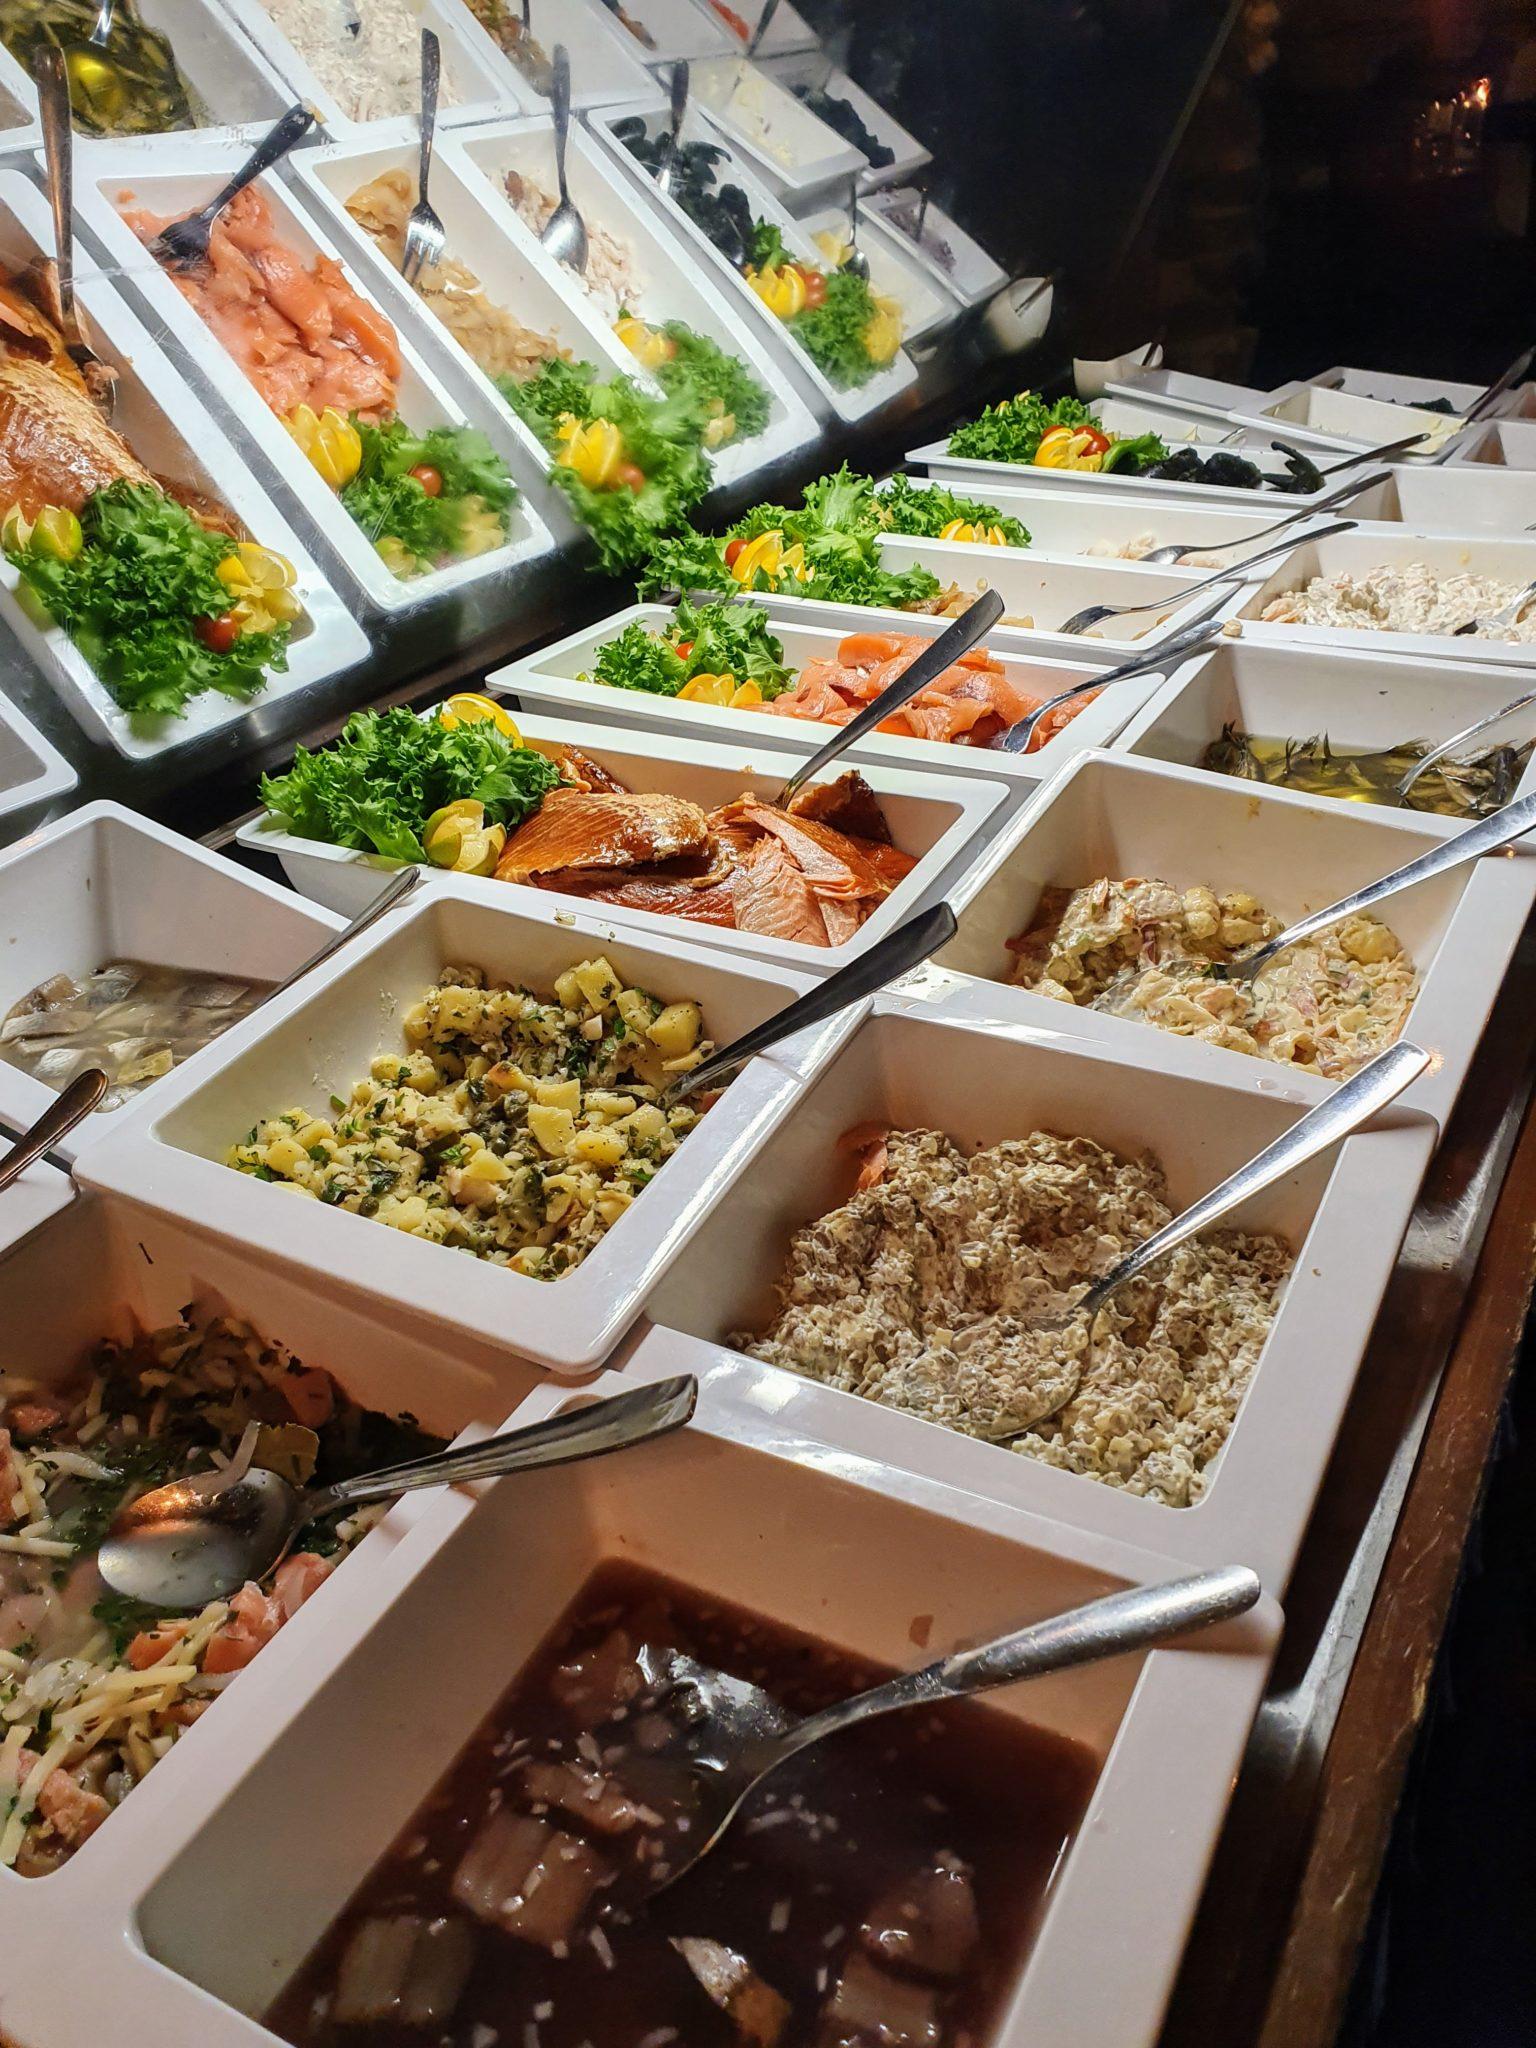 ravintola-arvostelu Pihvipirtti